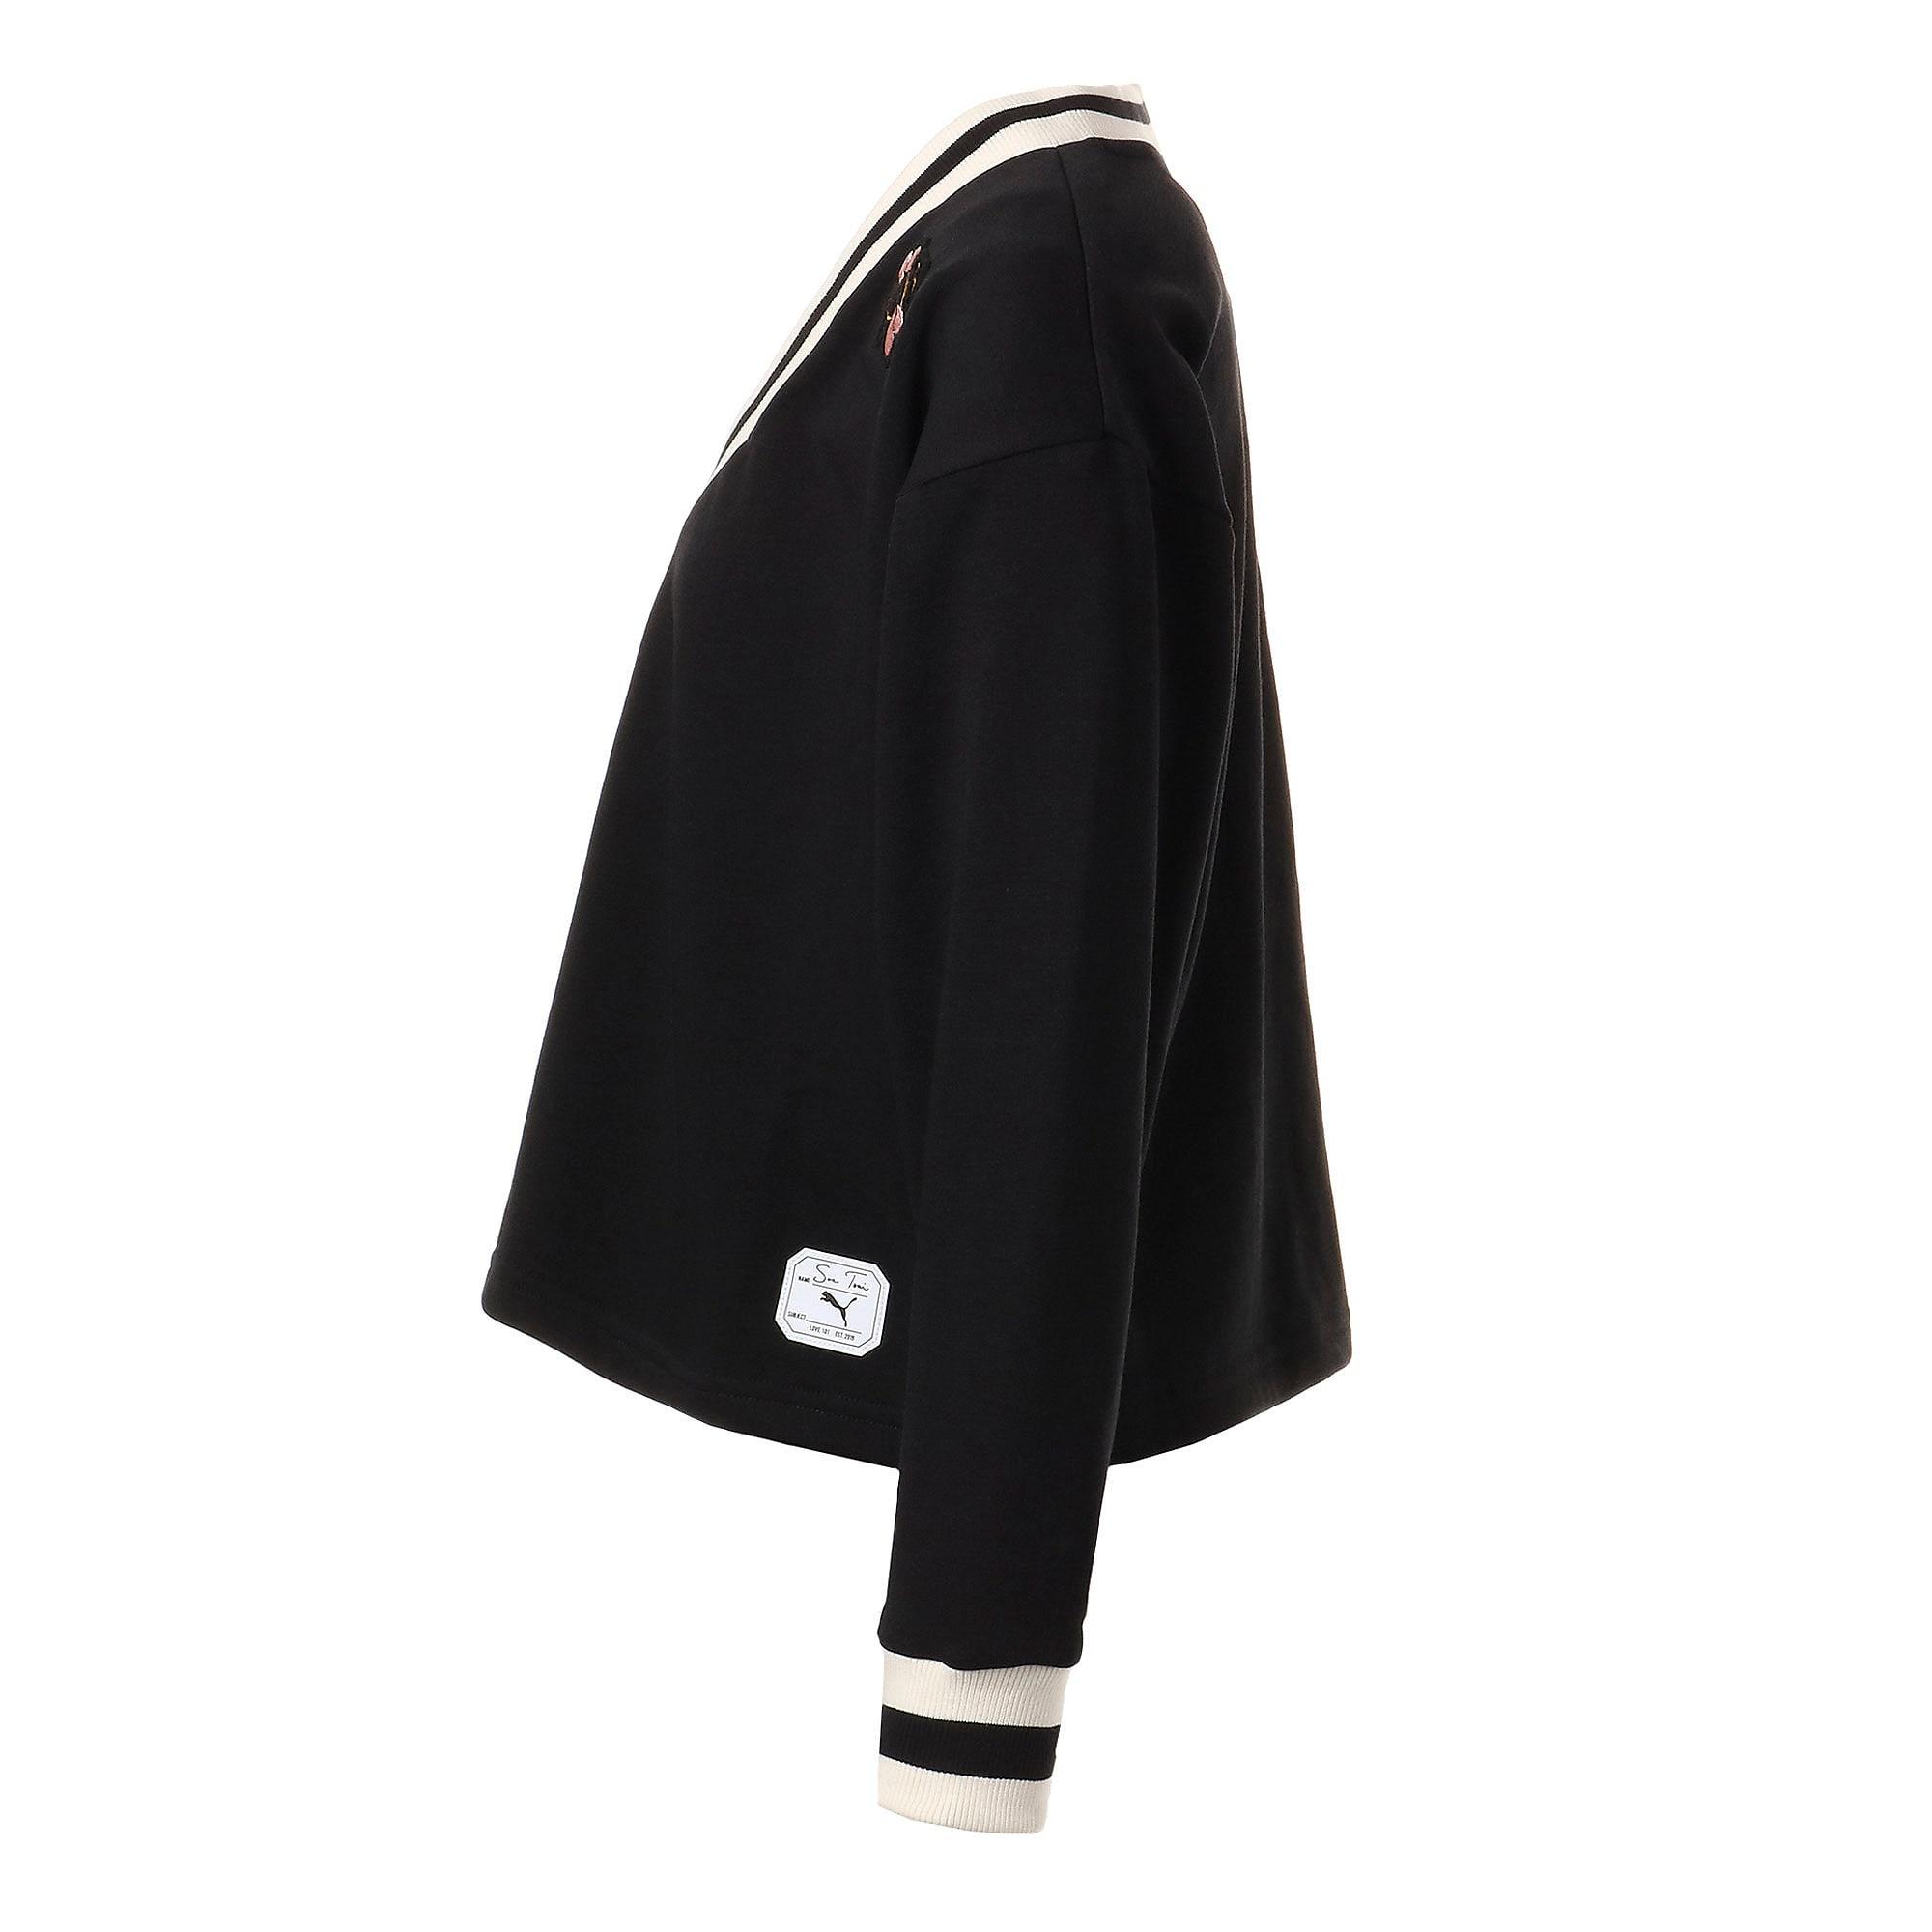 Thumbnail 2 of PUMA x SUE TSAI ウィメンズ Vネック セーター, Puma Black, medium-JPN